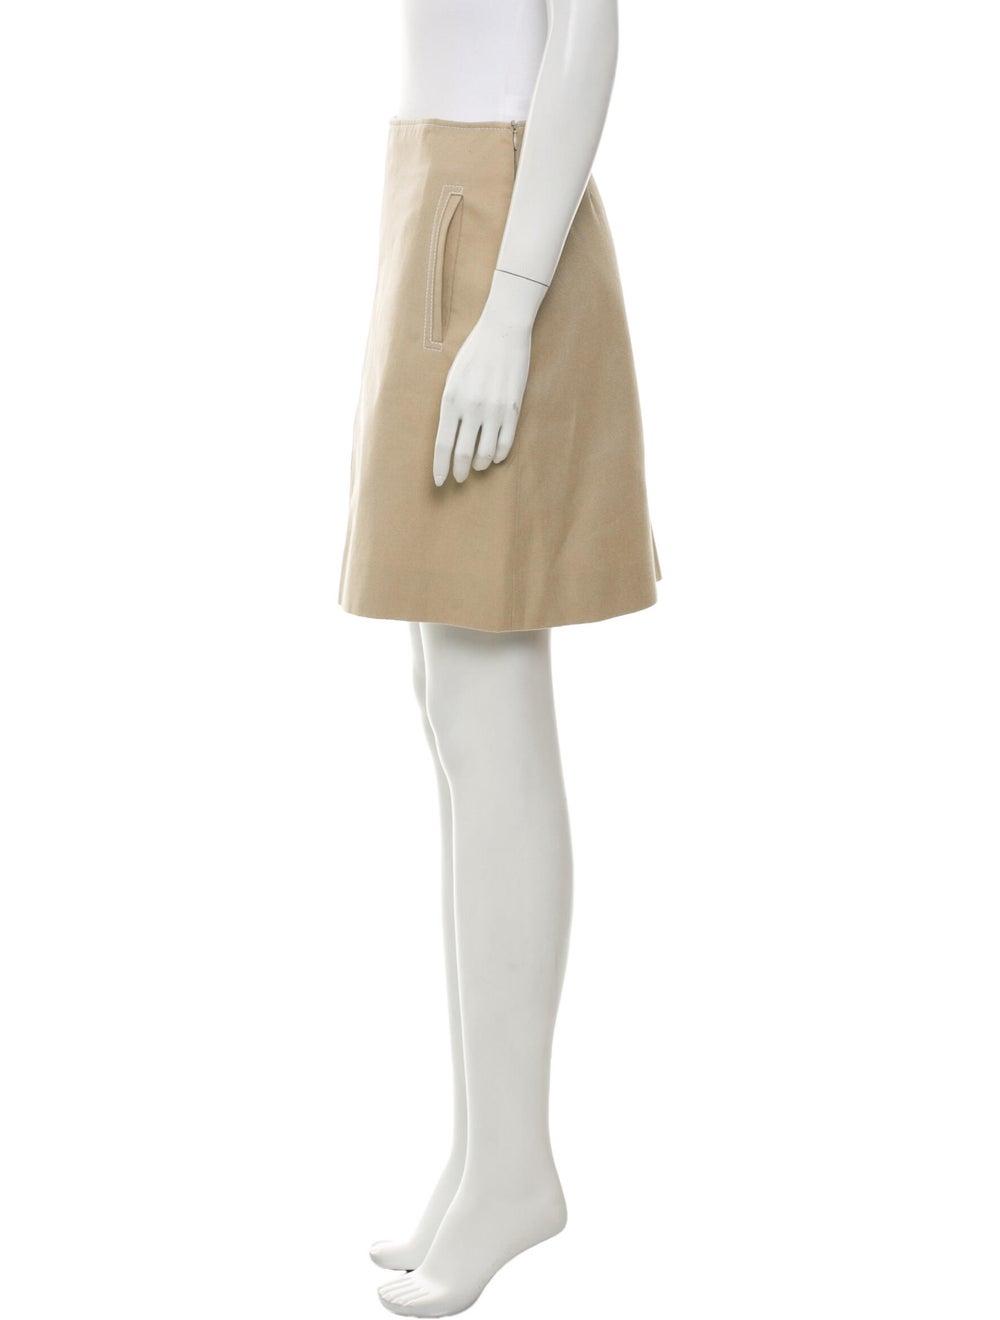 Acne Studios Mini Skirt - image 2